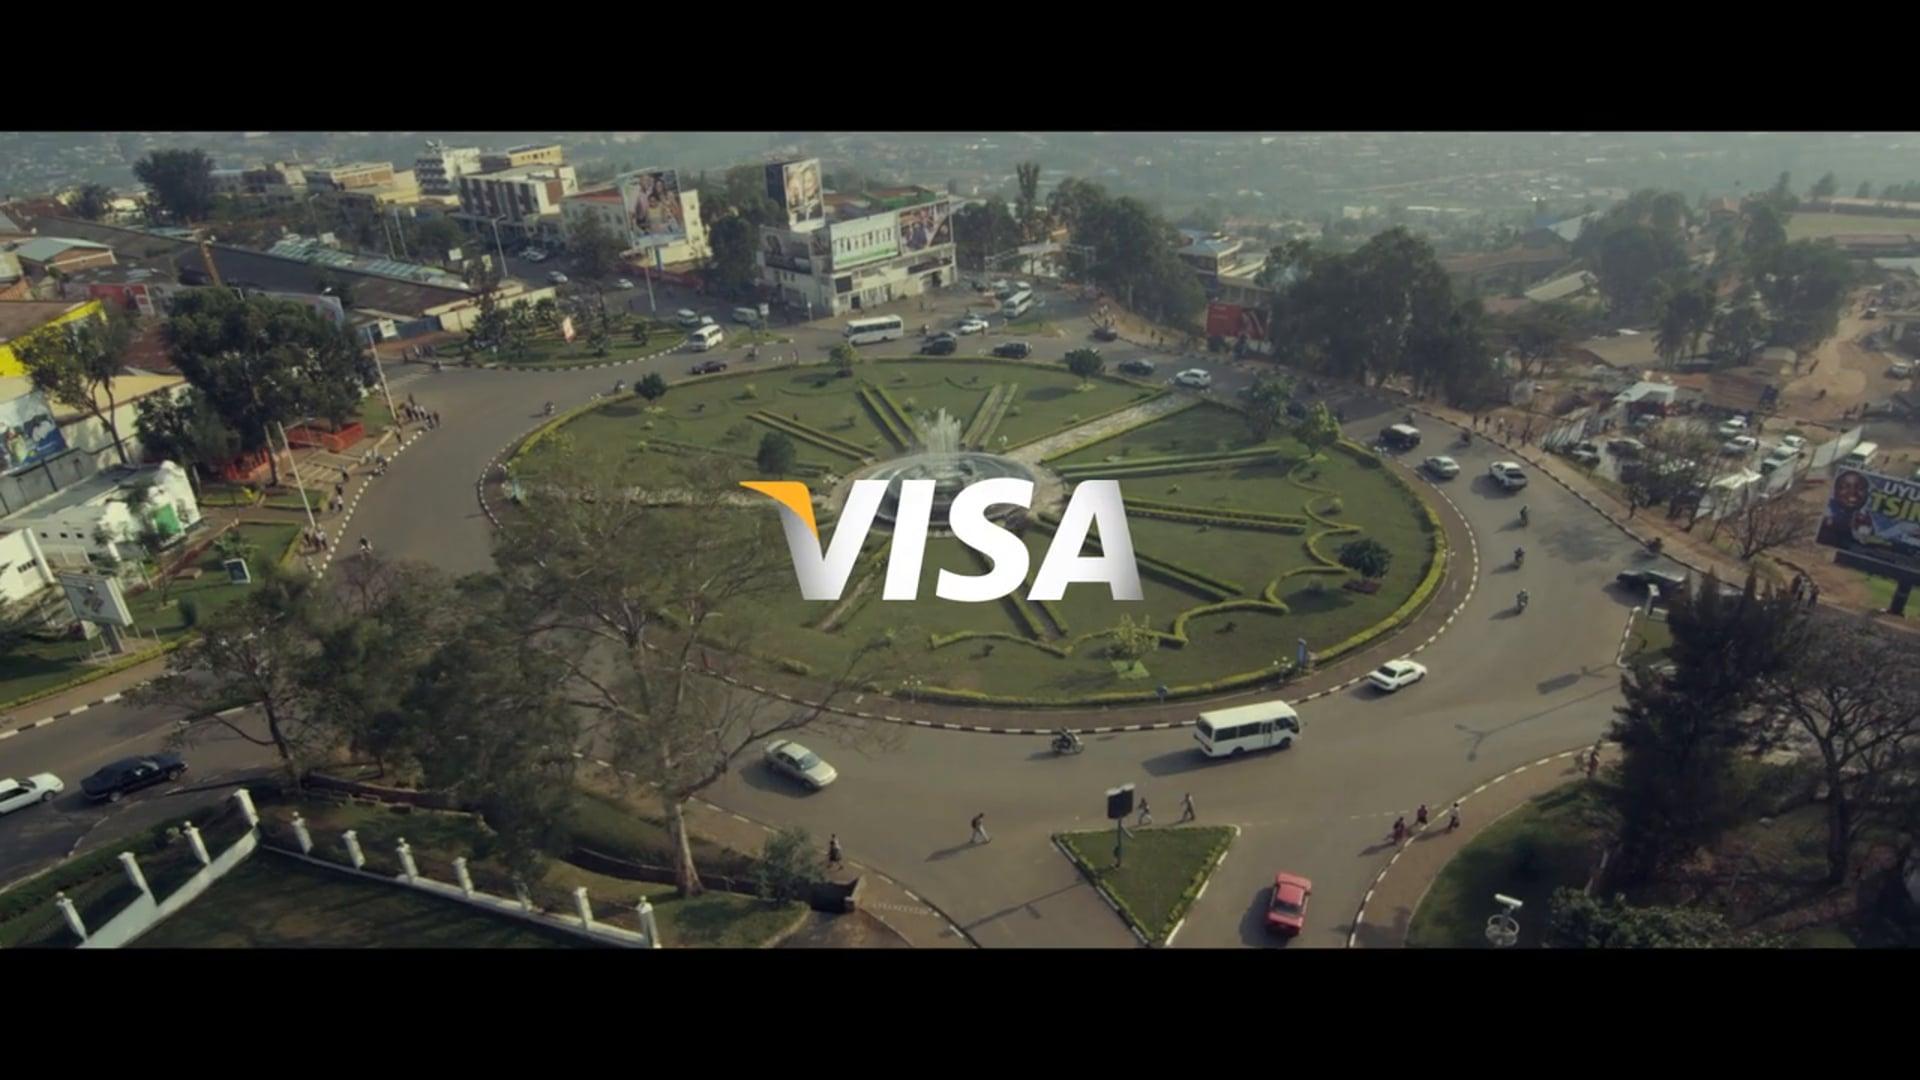 Visa: Africa